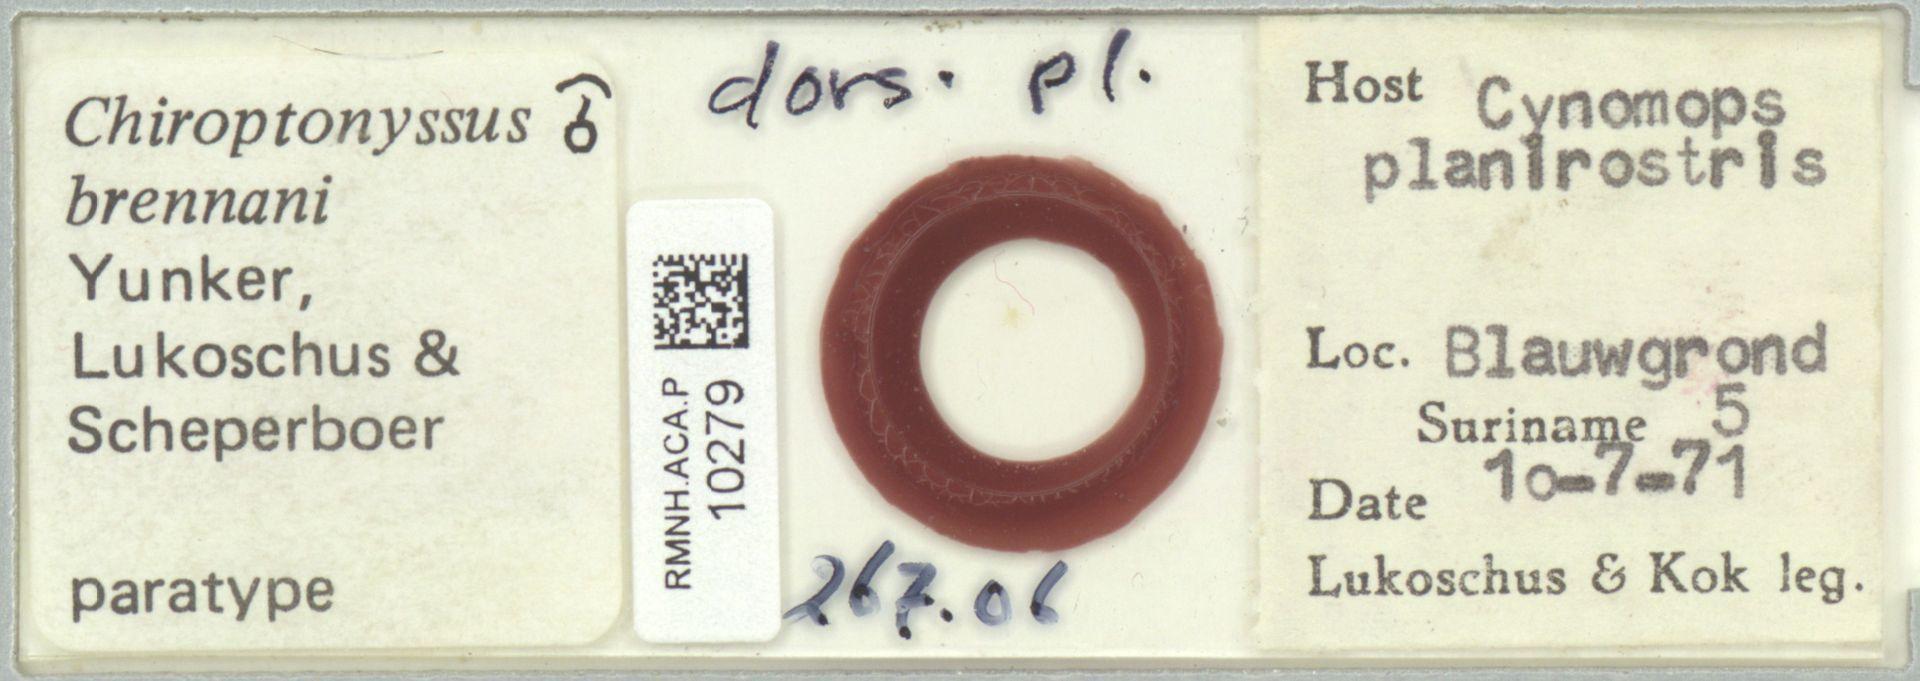 RMNH.ACA.P.10279 | Chiroptonyssus brennani Yunker, Lukoschus & Scheperboer